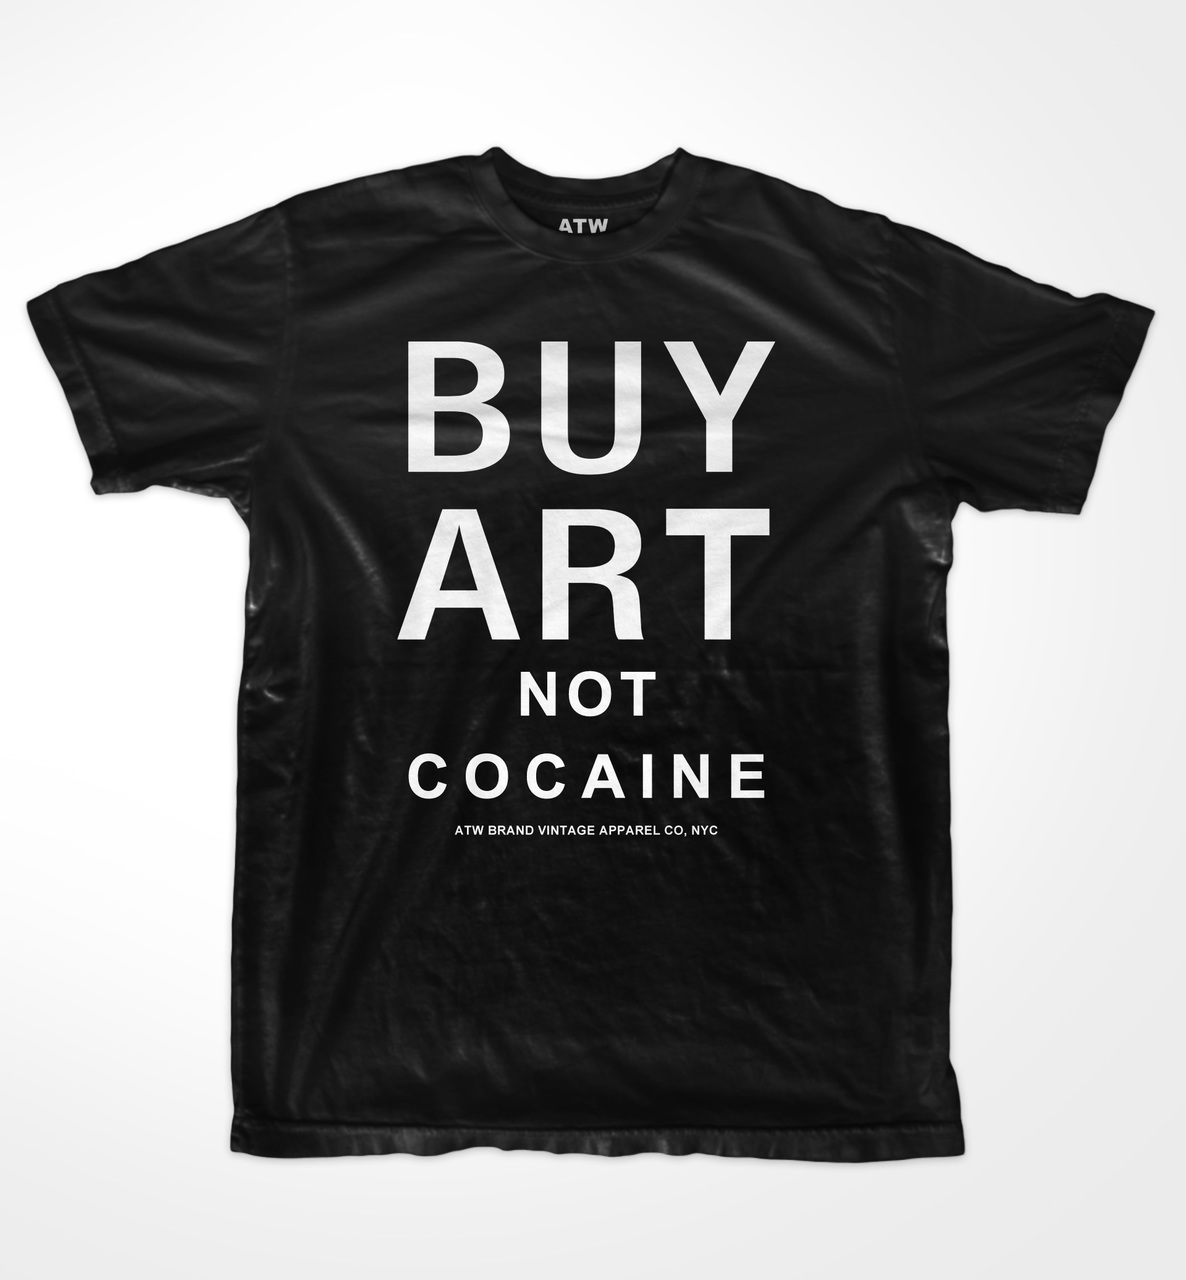 ATW_Buy_Art_Not_Cocaine_tee_Black_by_Koe_Rodriguez.jpg.ce7ec426174e993bf953806272f26c05.jpg